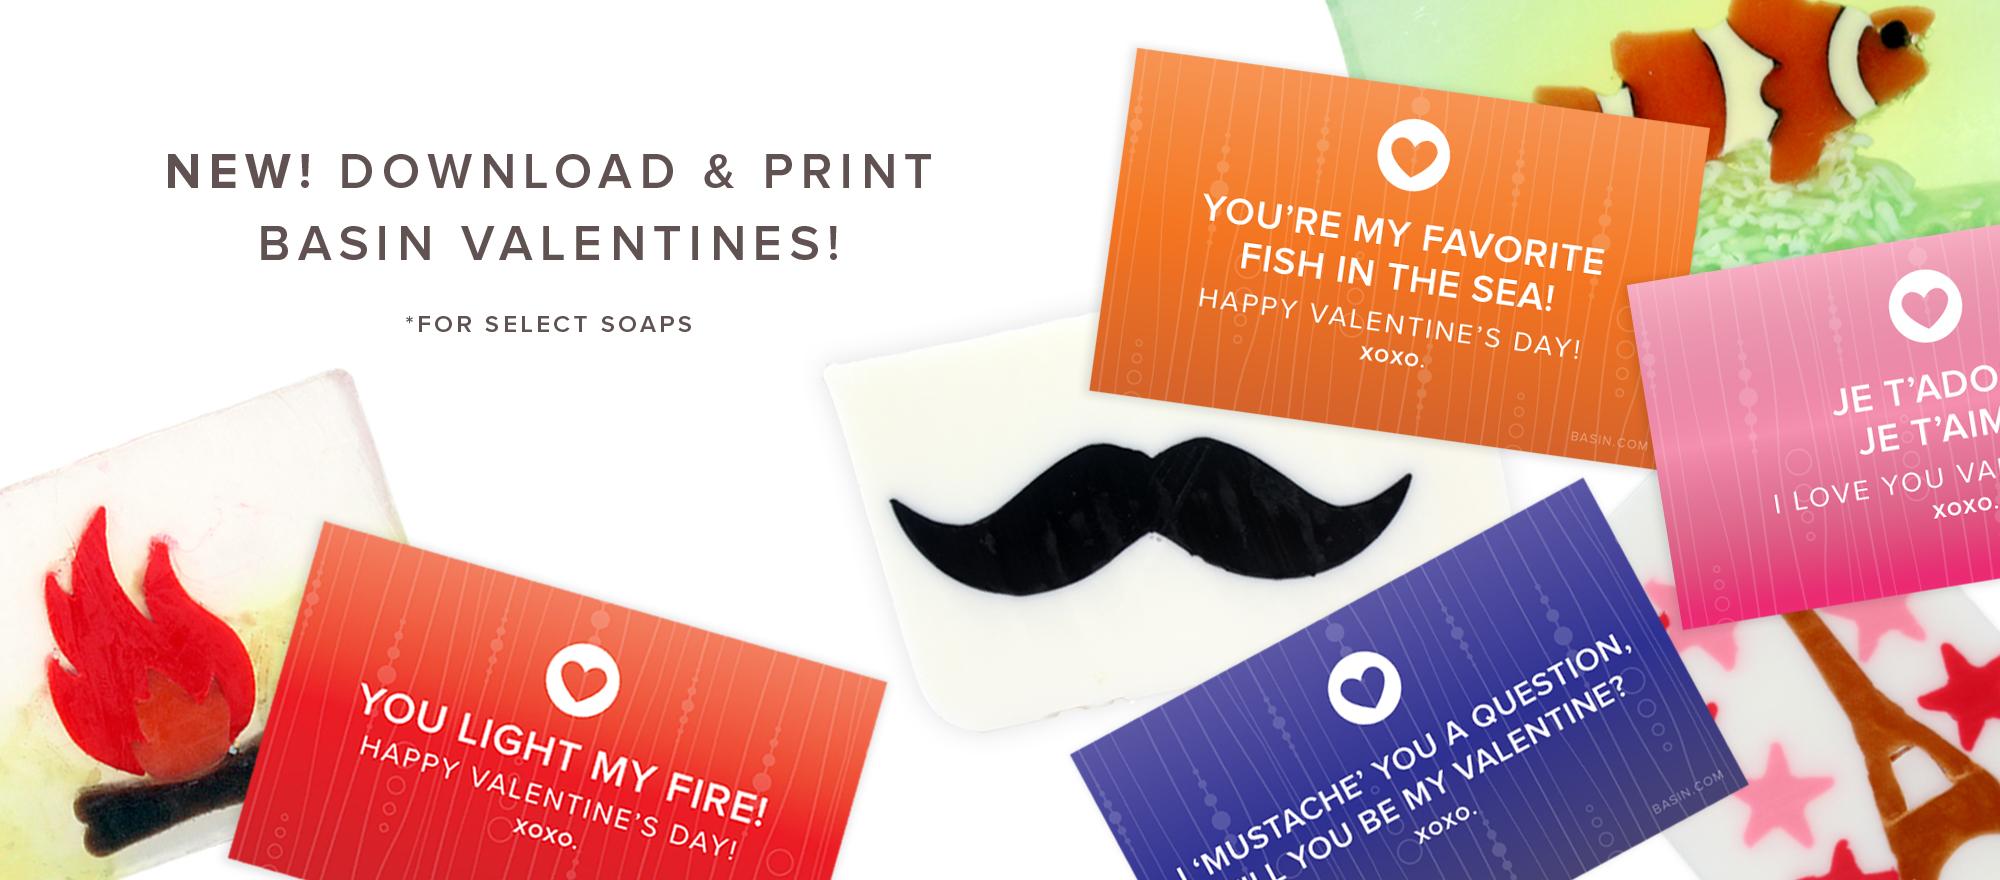 Downloadable Soap Valentines